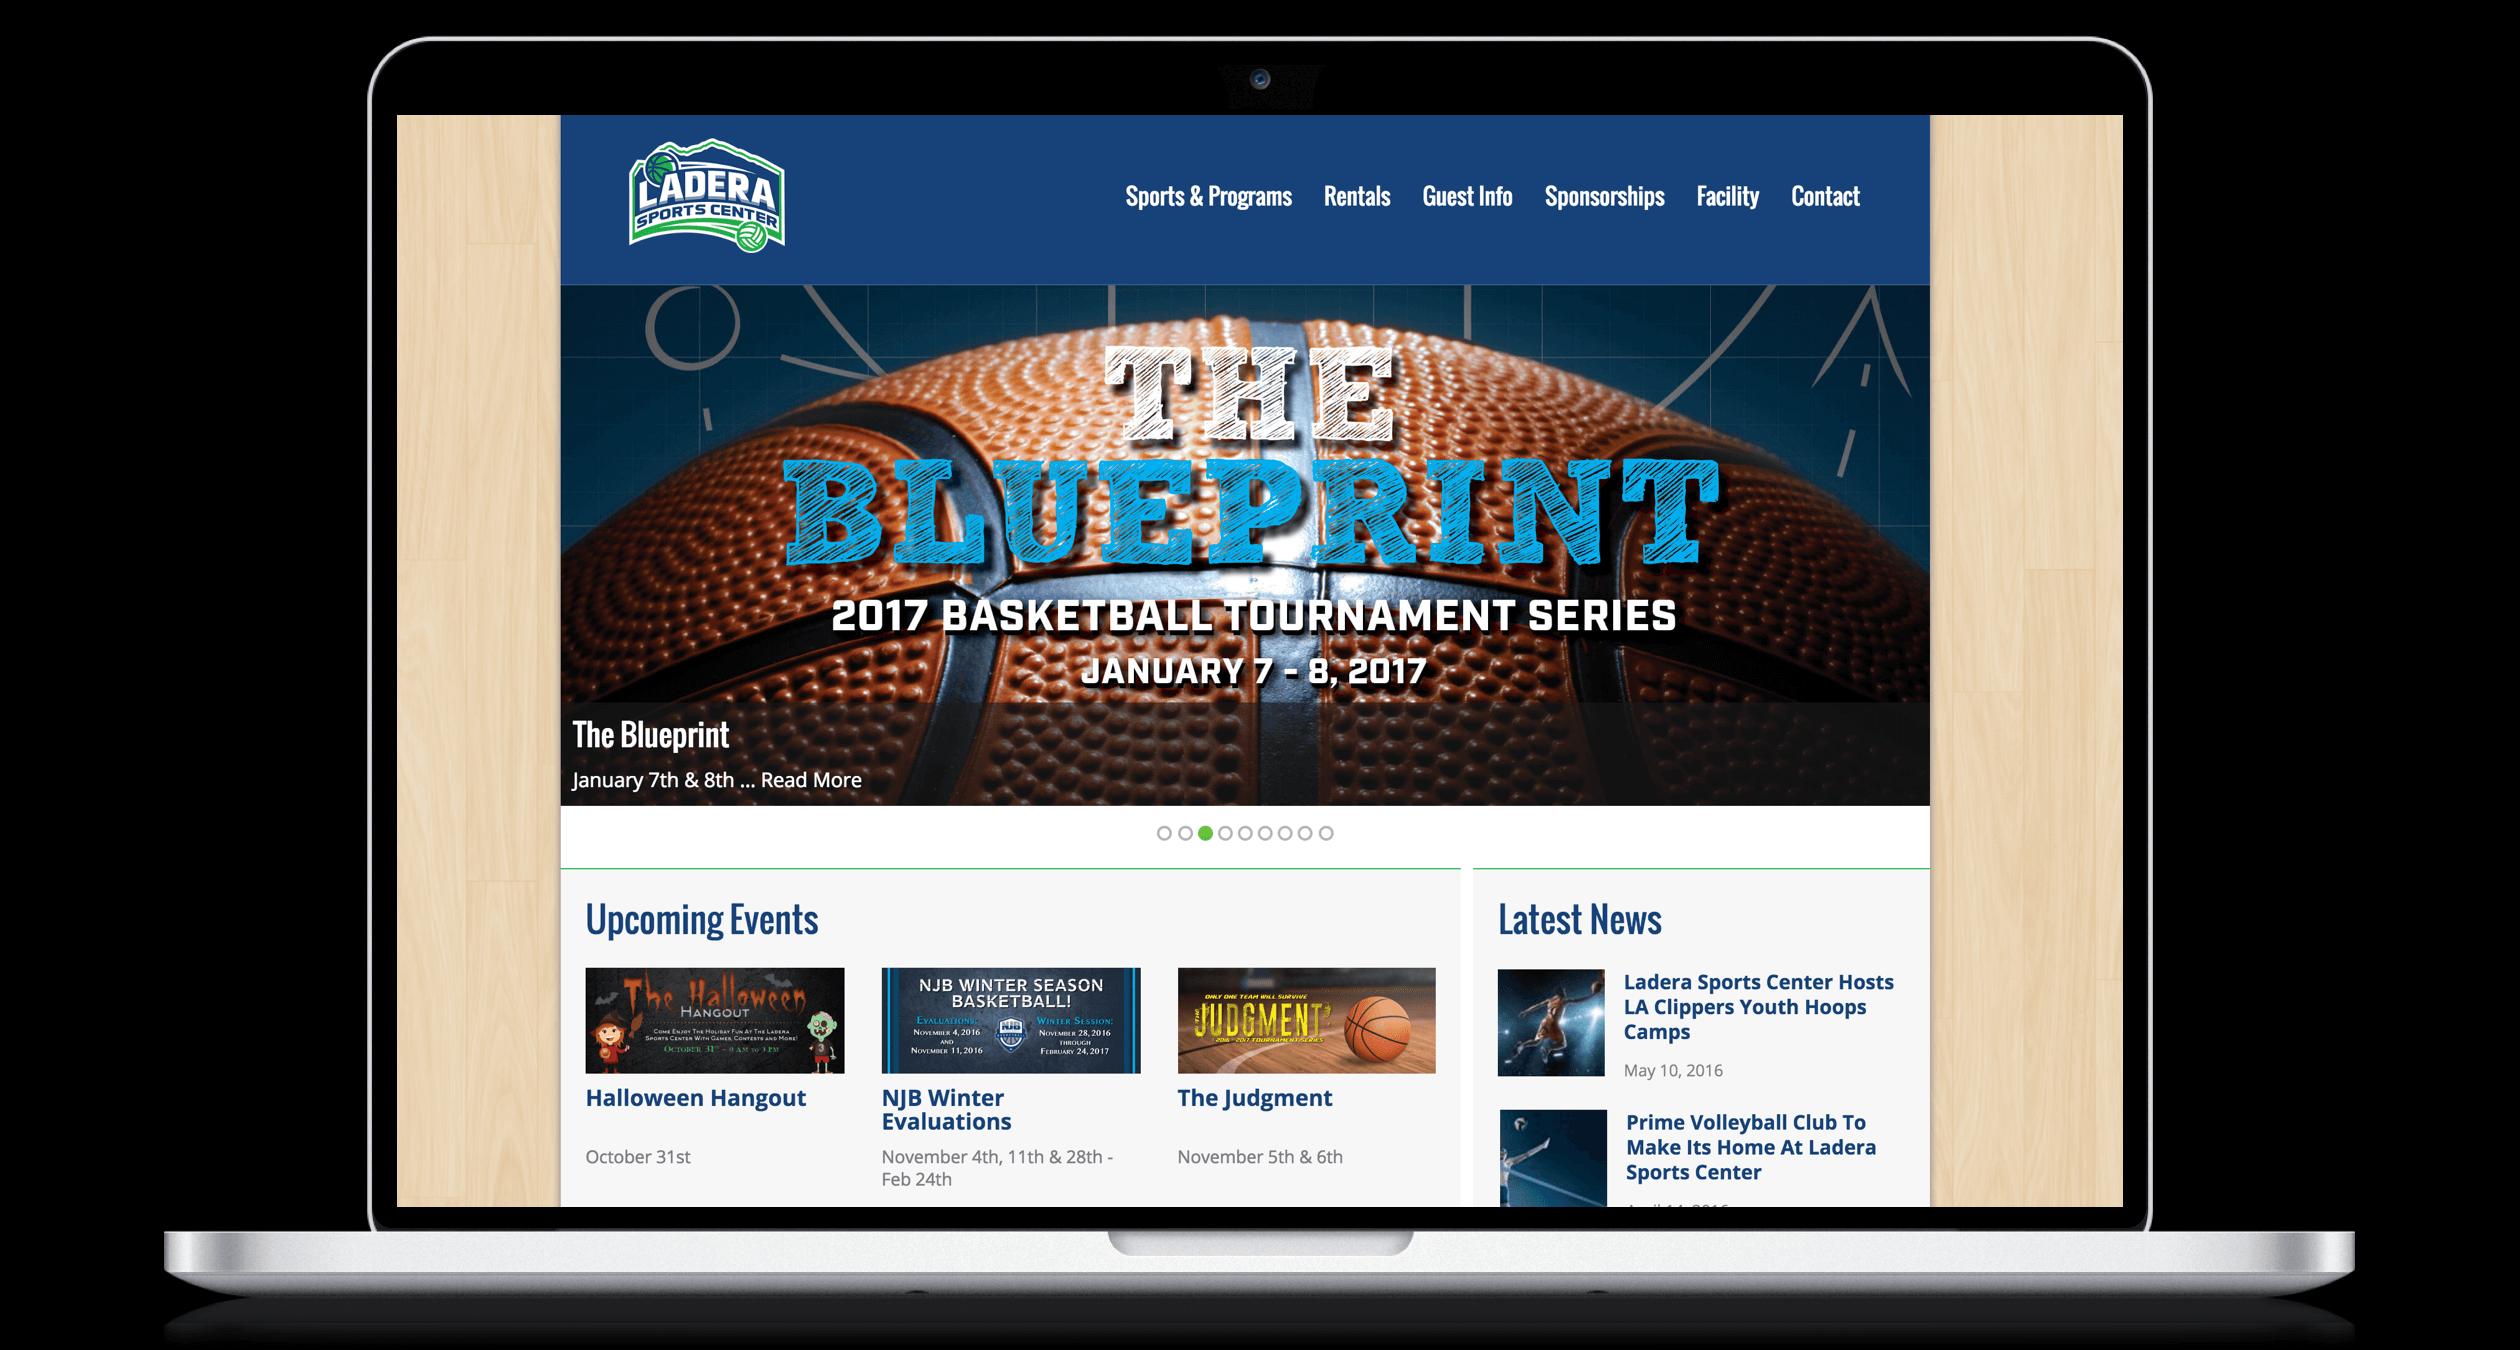 PHX-Web-Agency-Ladera-Sports-Center-Website-Design-After